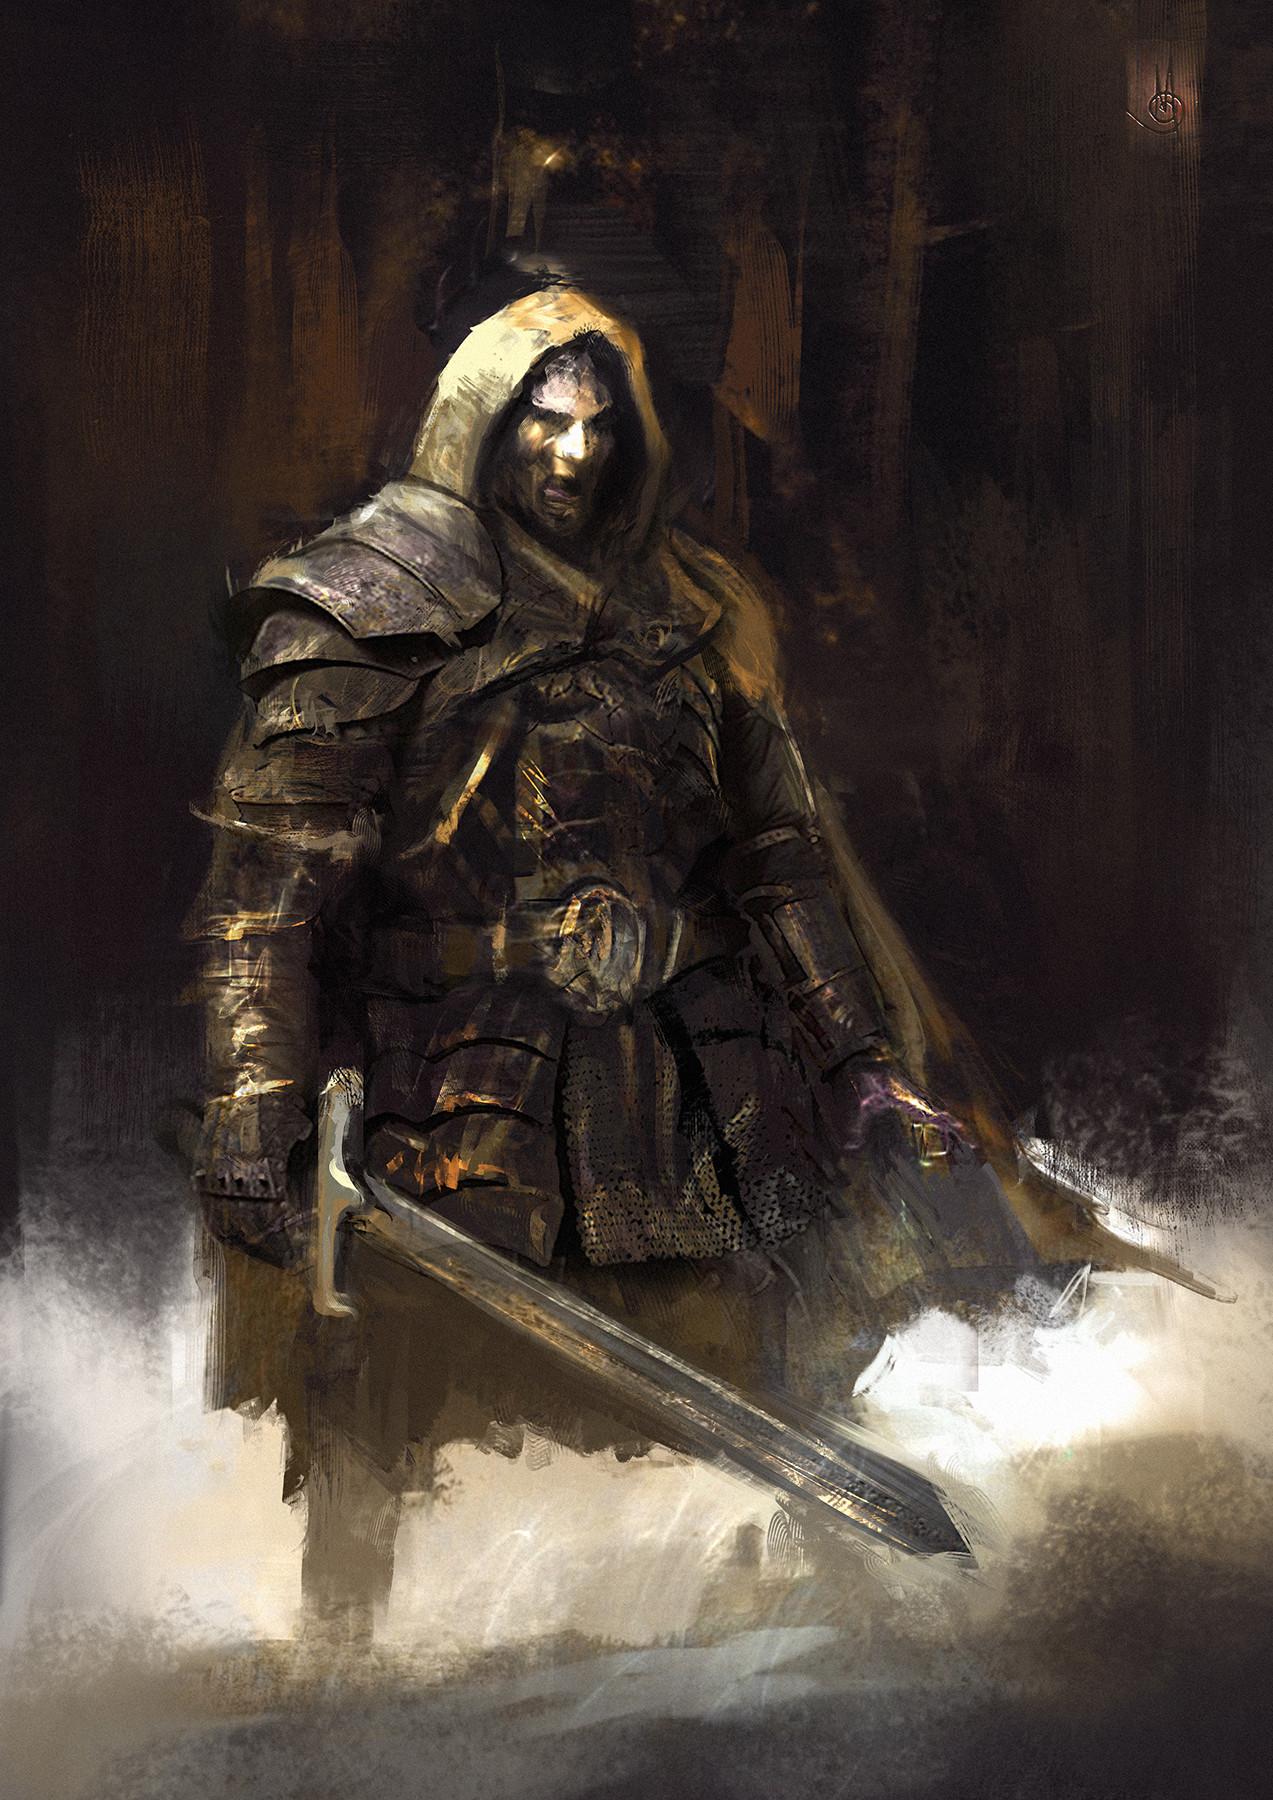 Murat gul warlock by muratgul